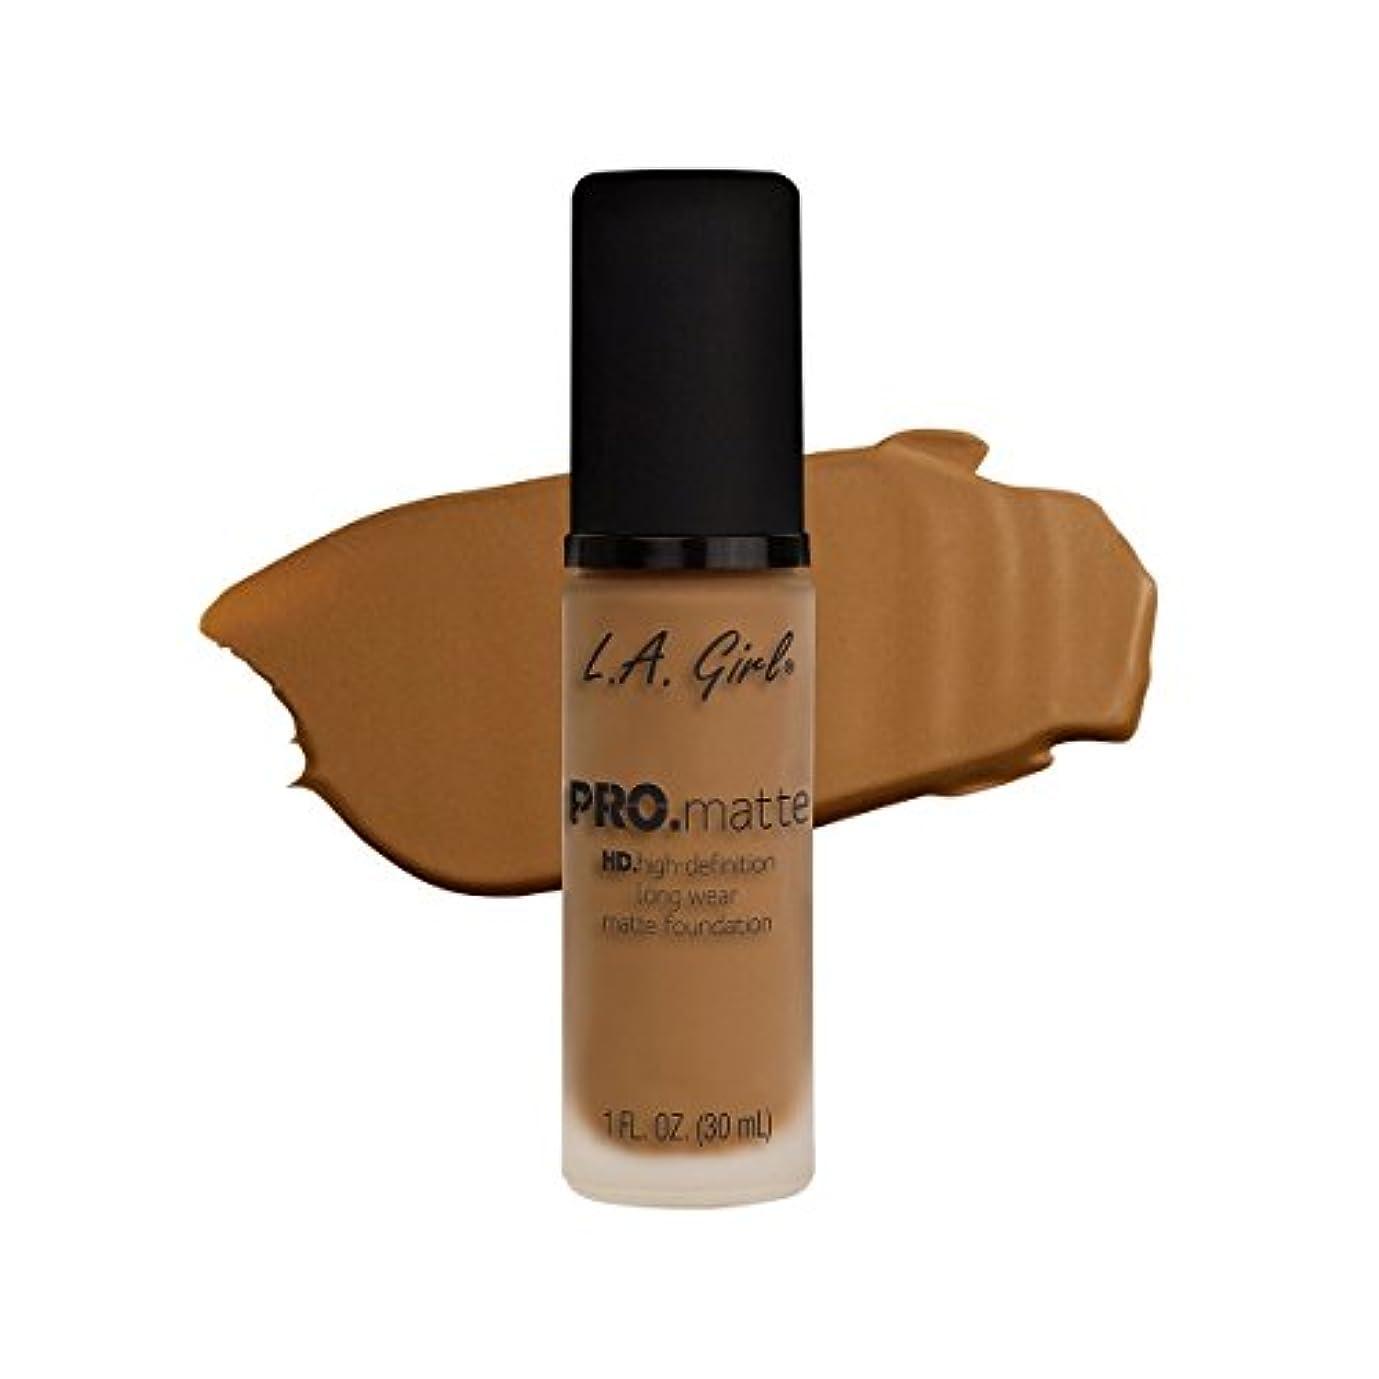 (3 Pack) L.A. GIRL Pro Matte Foundation - Caramel (並行輸入品)